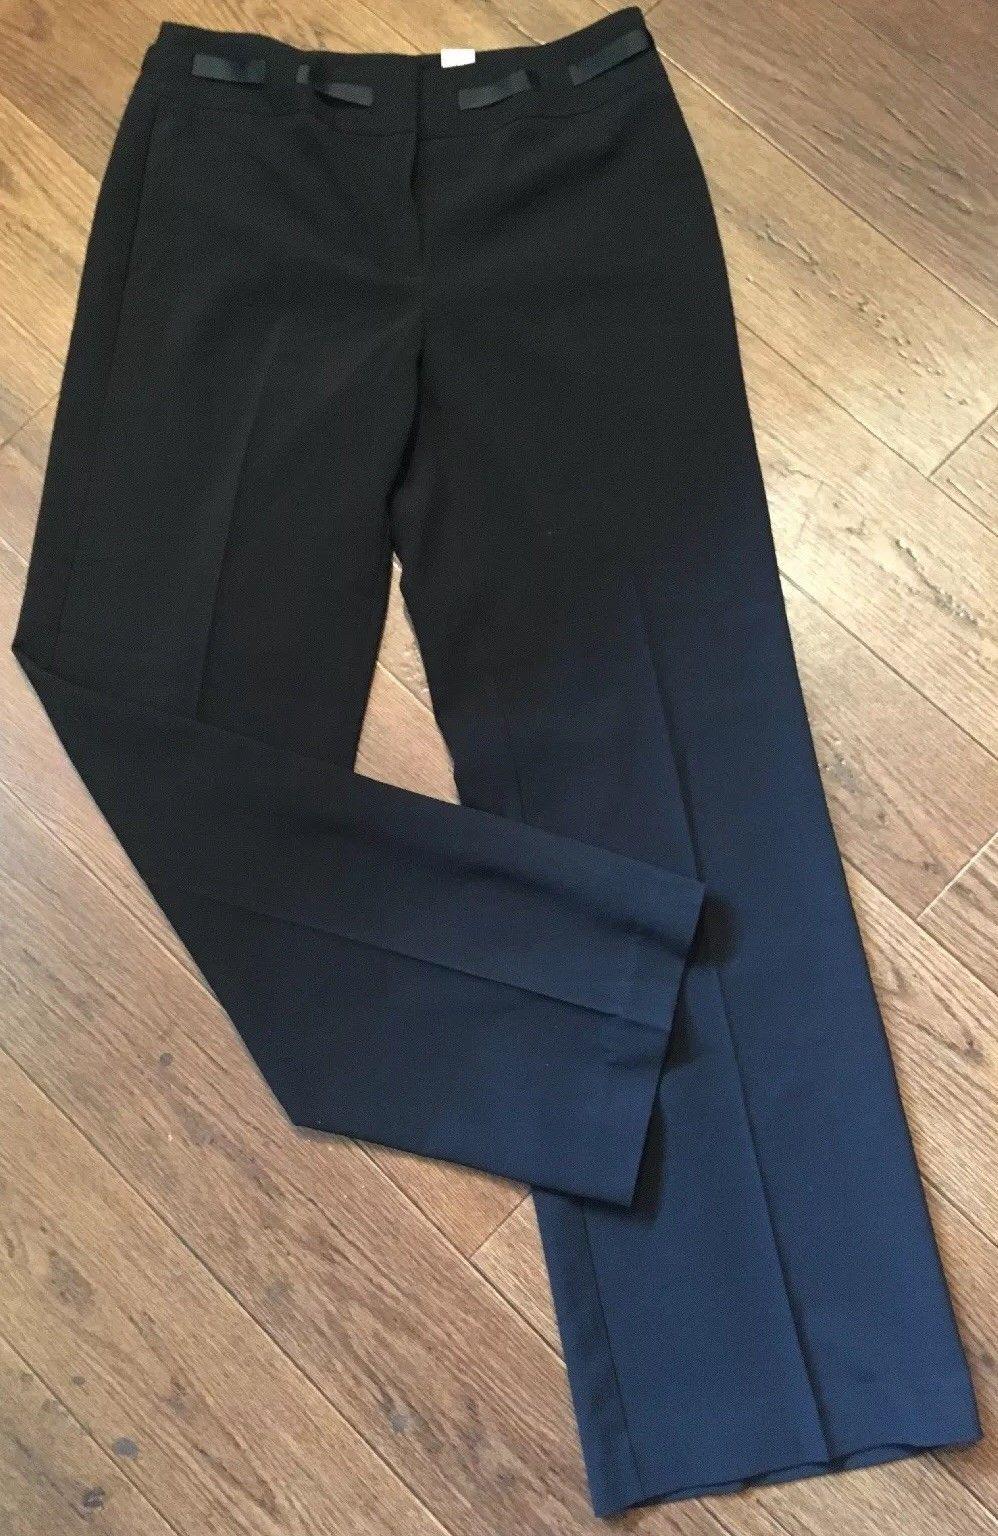 d17d9a9ff0 NWT Womens Dressbarn Black Dress pants size and 43 similar items. S l1600